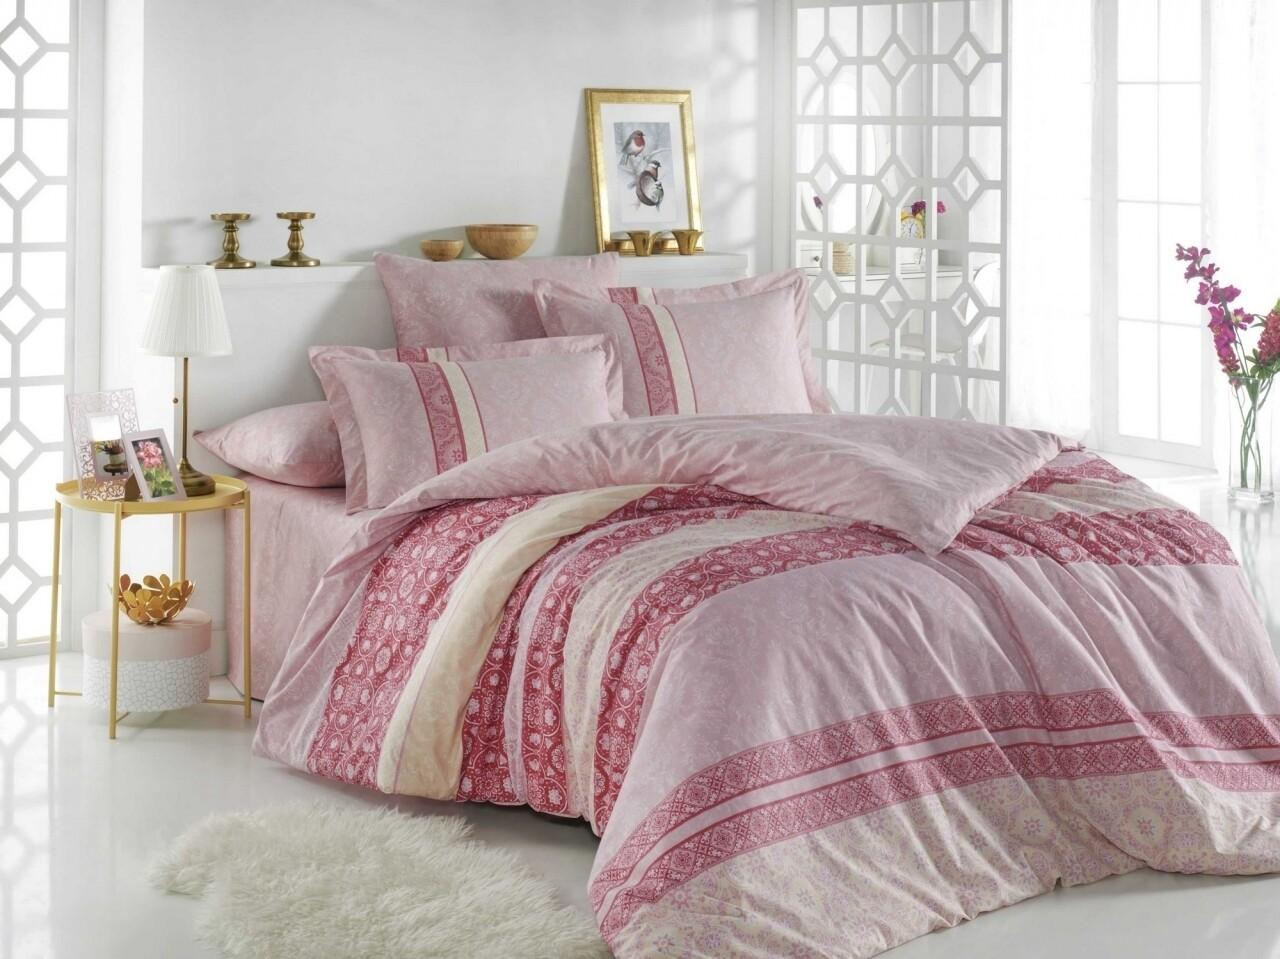 Lenjerie de pat pentru o persoana, 3 piese, 100% bumbac poplin, Hobby, Emma, roz